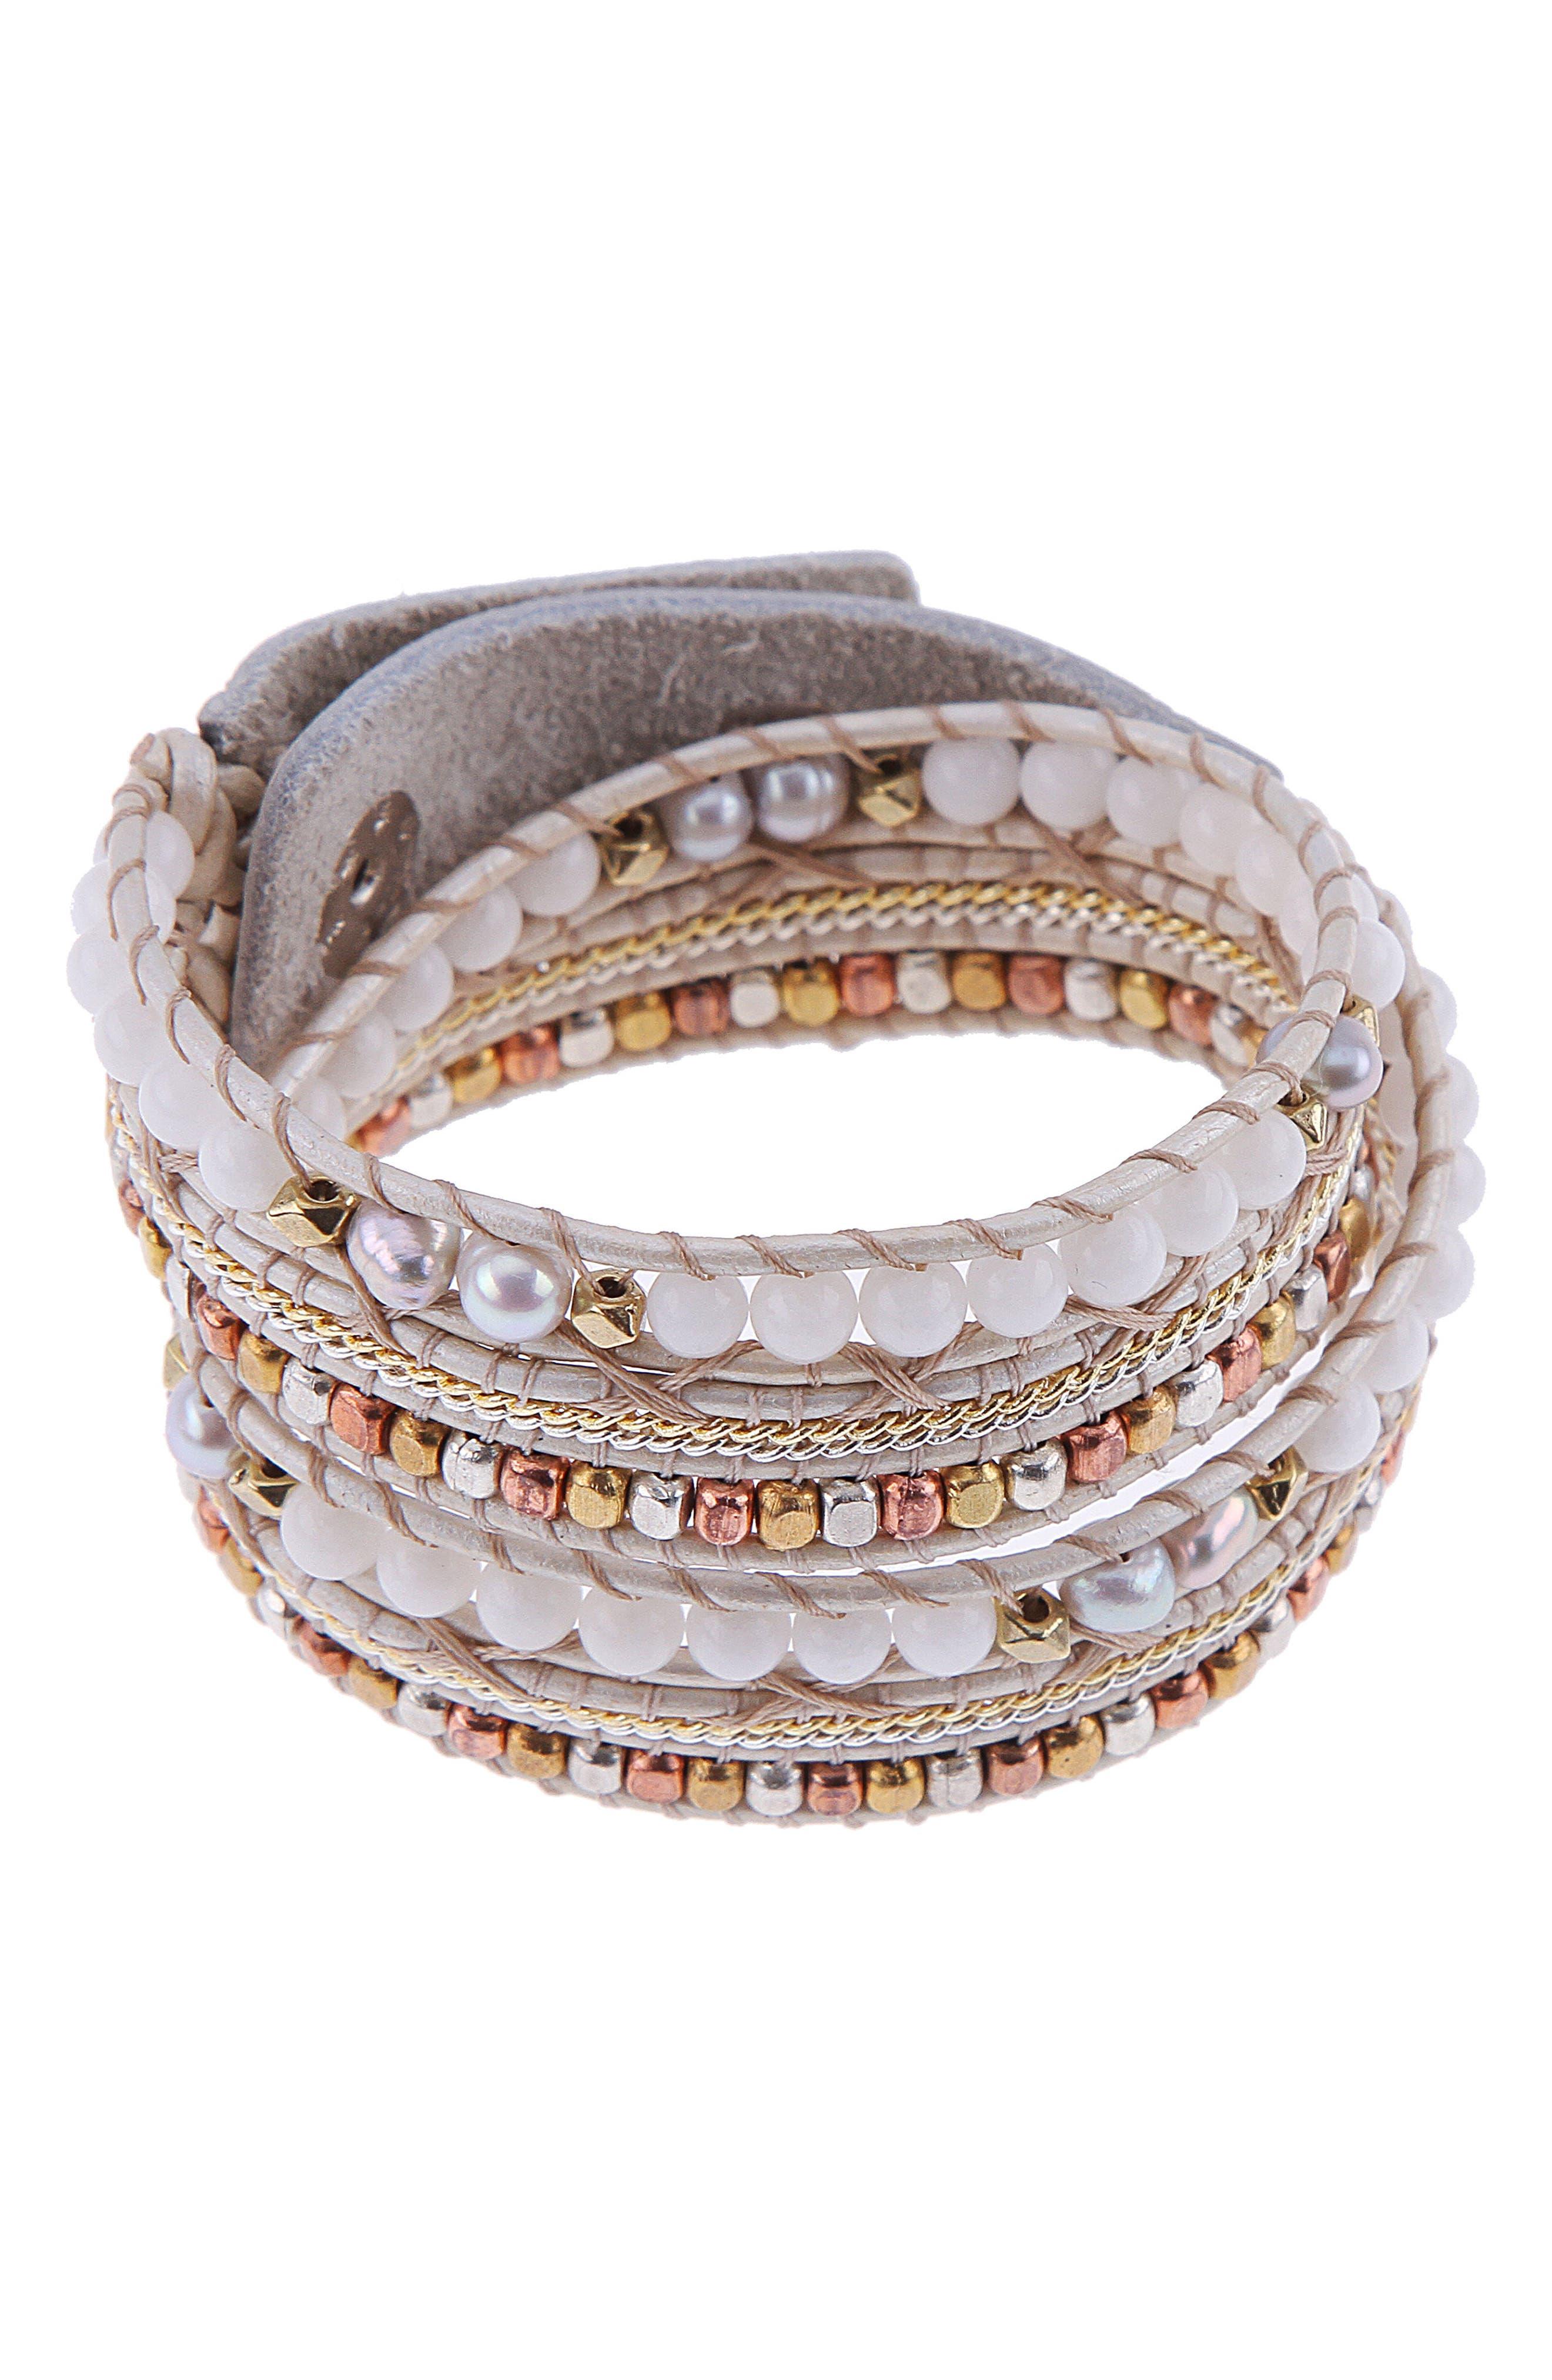 Stone & Metal Wrap Bracelet,                             Main thumbnail 1, color,                             Peach